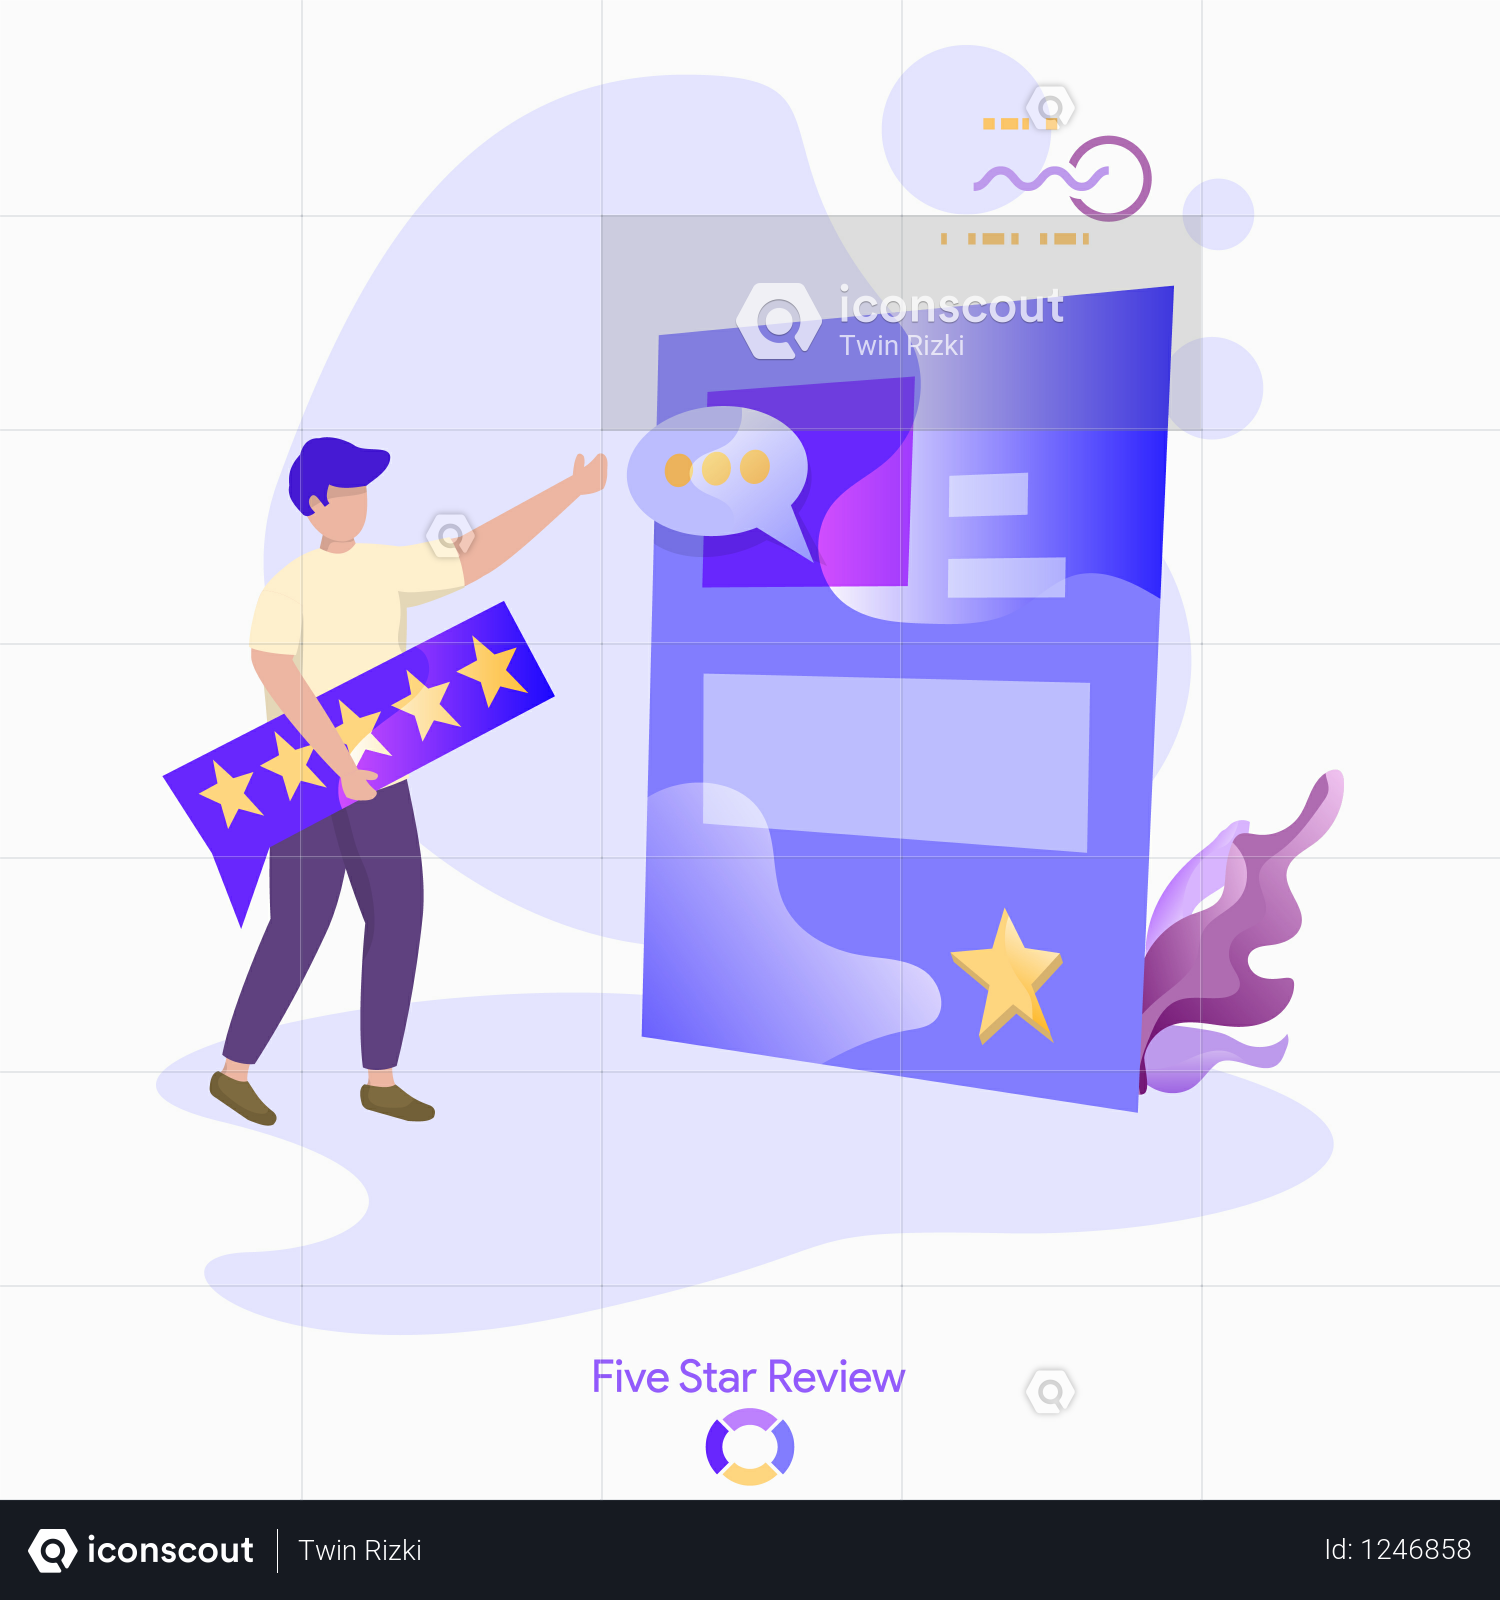 Premium Vector Illustration Of Five Star Review Illustration Download In Png Vector Format Vector Illustration Communication Illustration Illustration